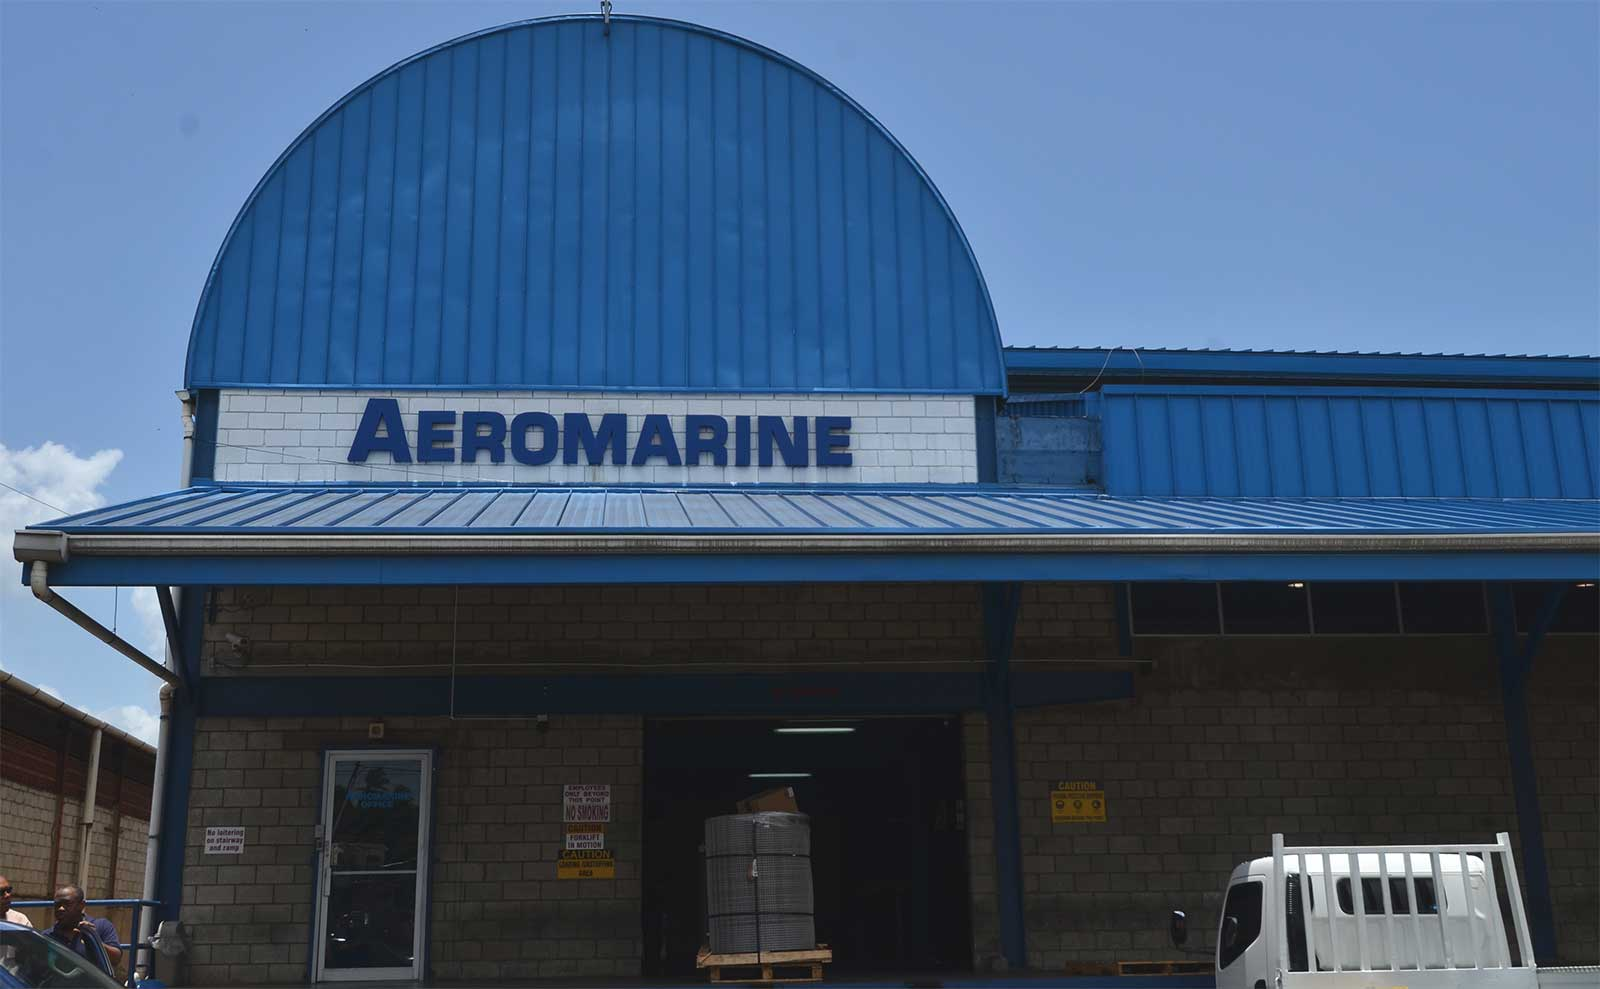 Aeromarine | shipping via the sea